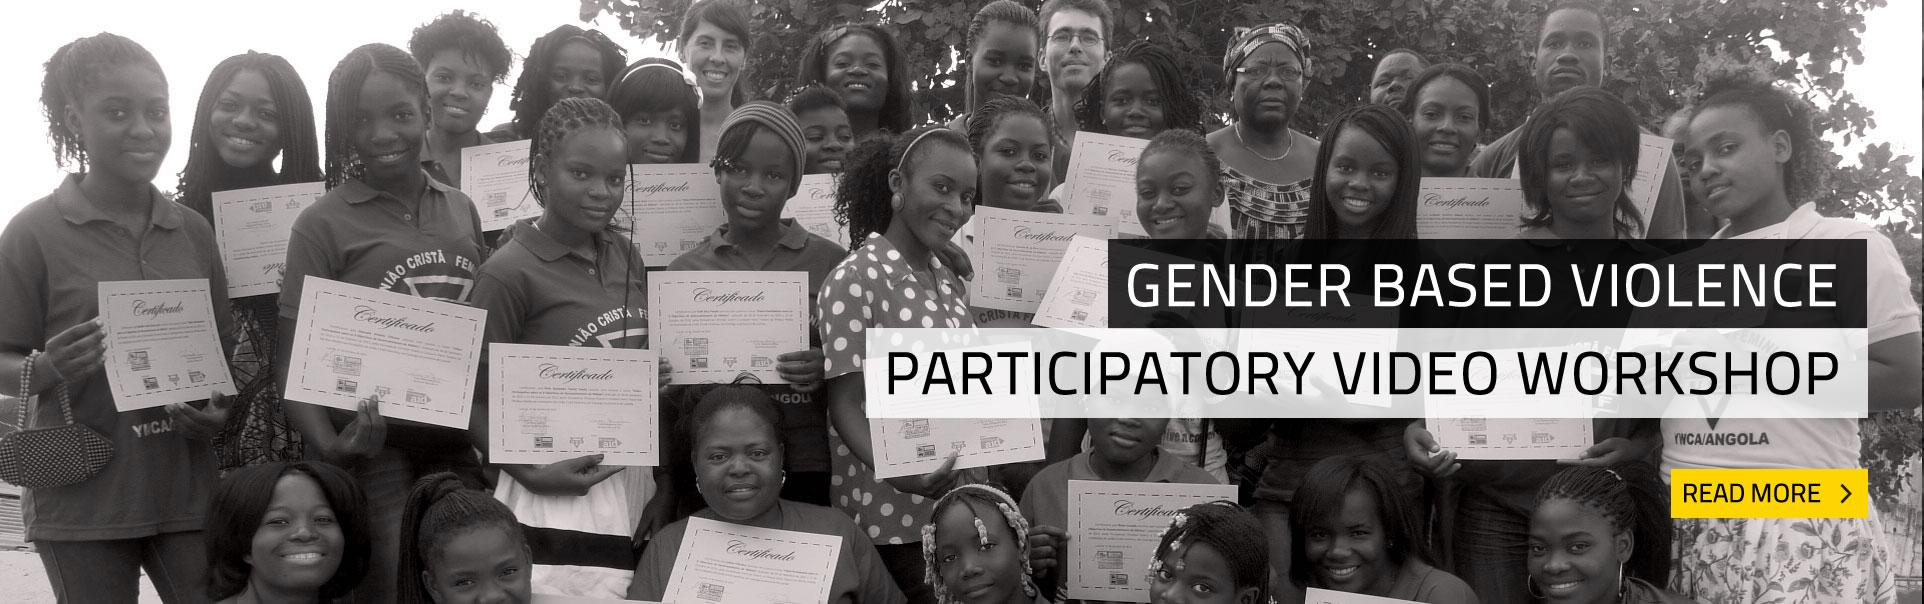 Gender-based violence in Luanda